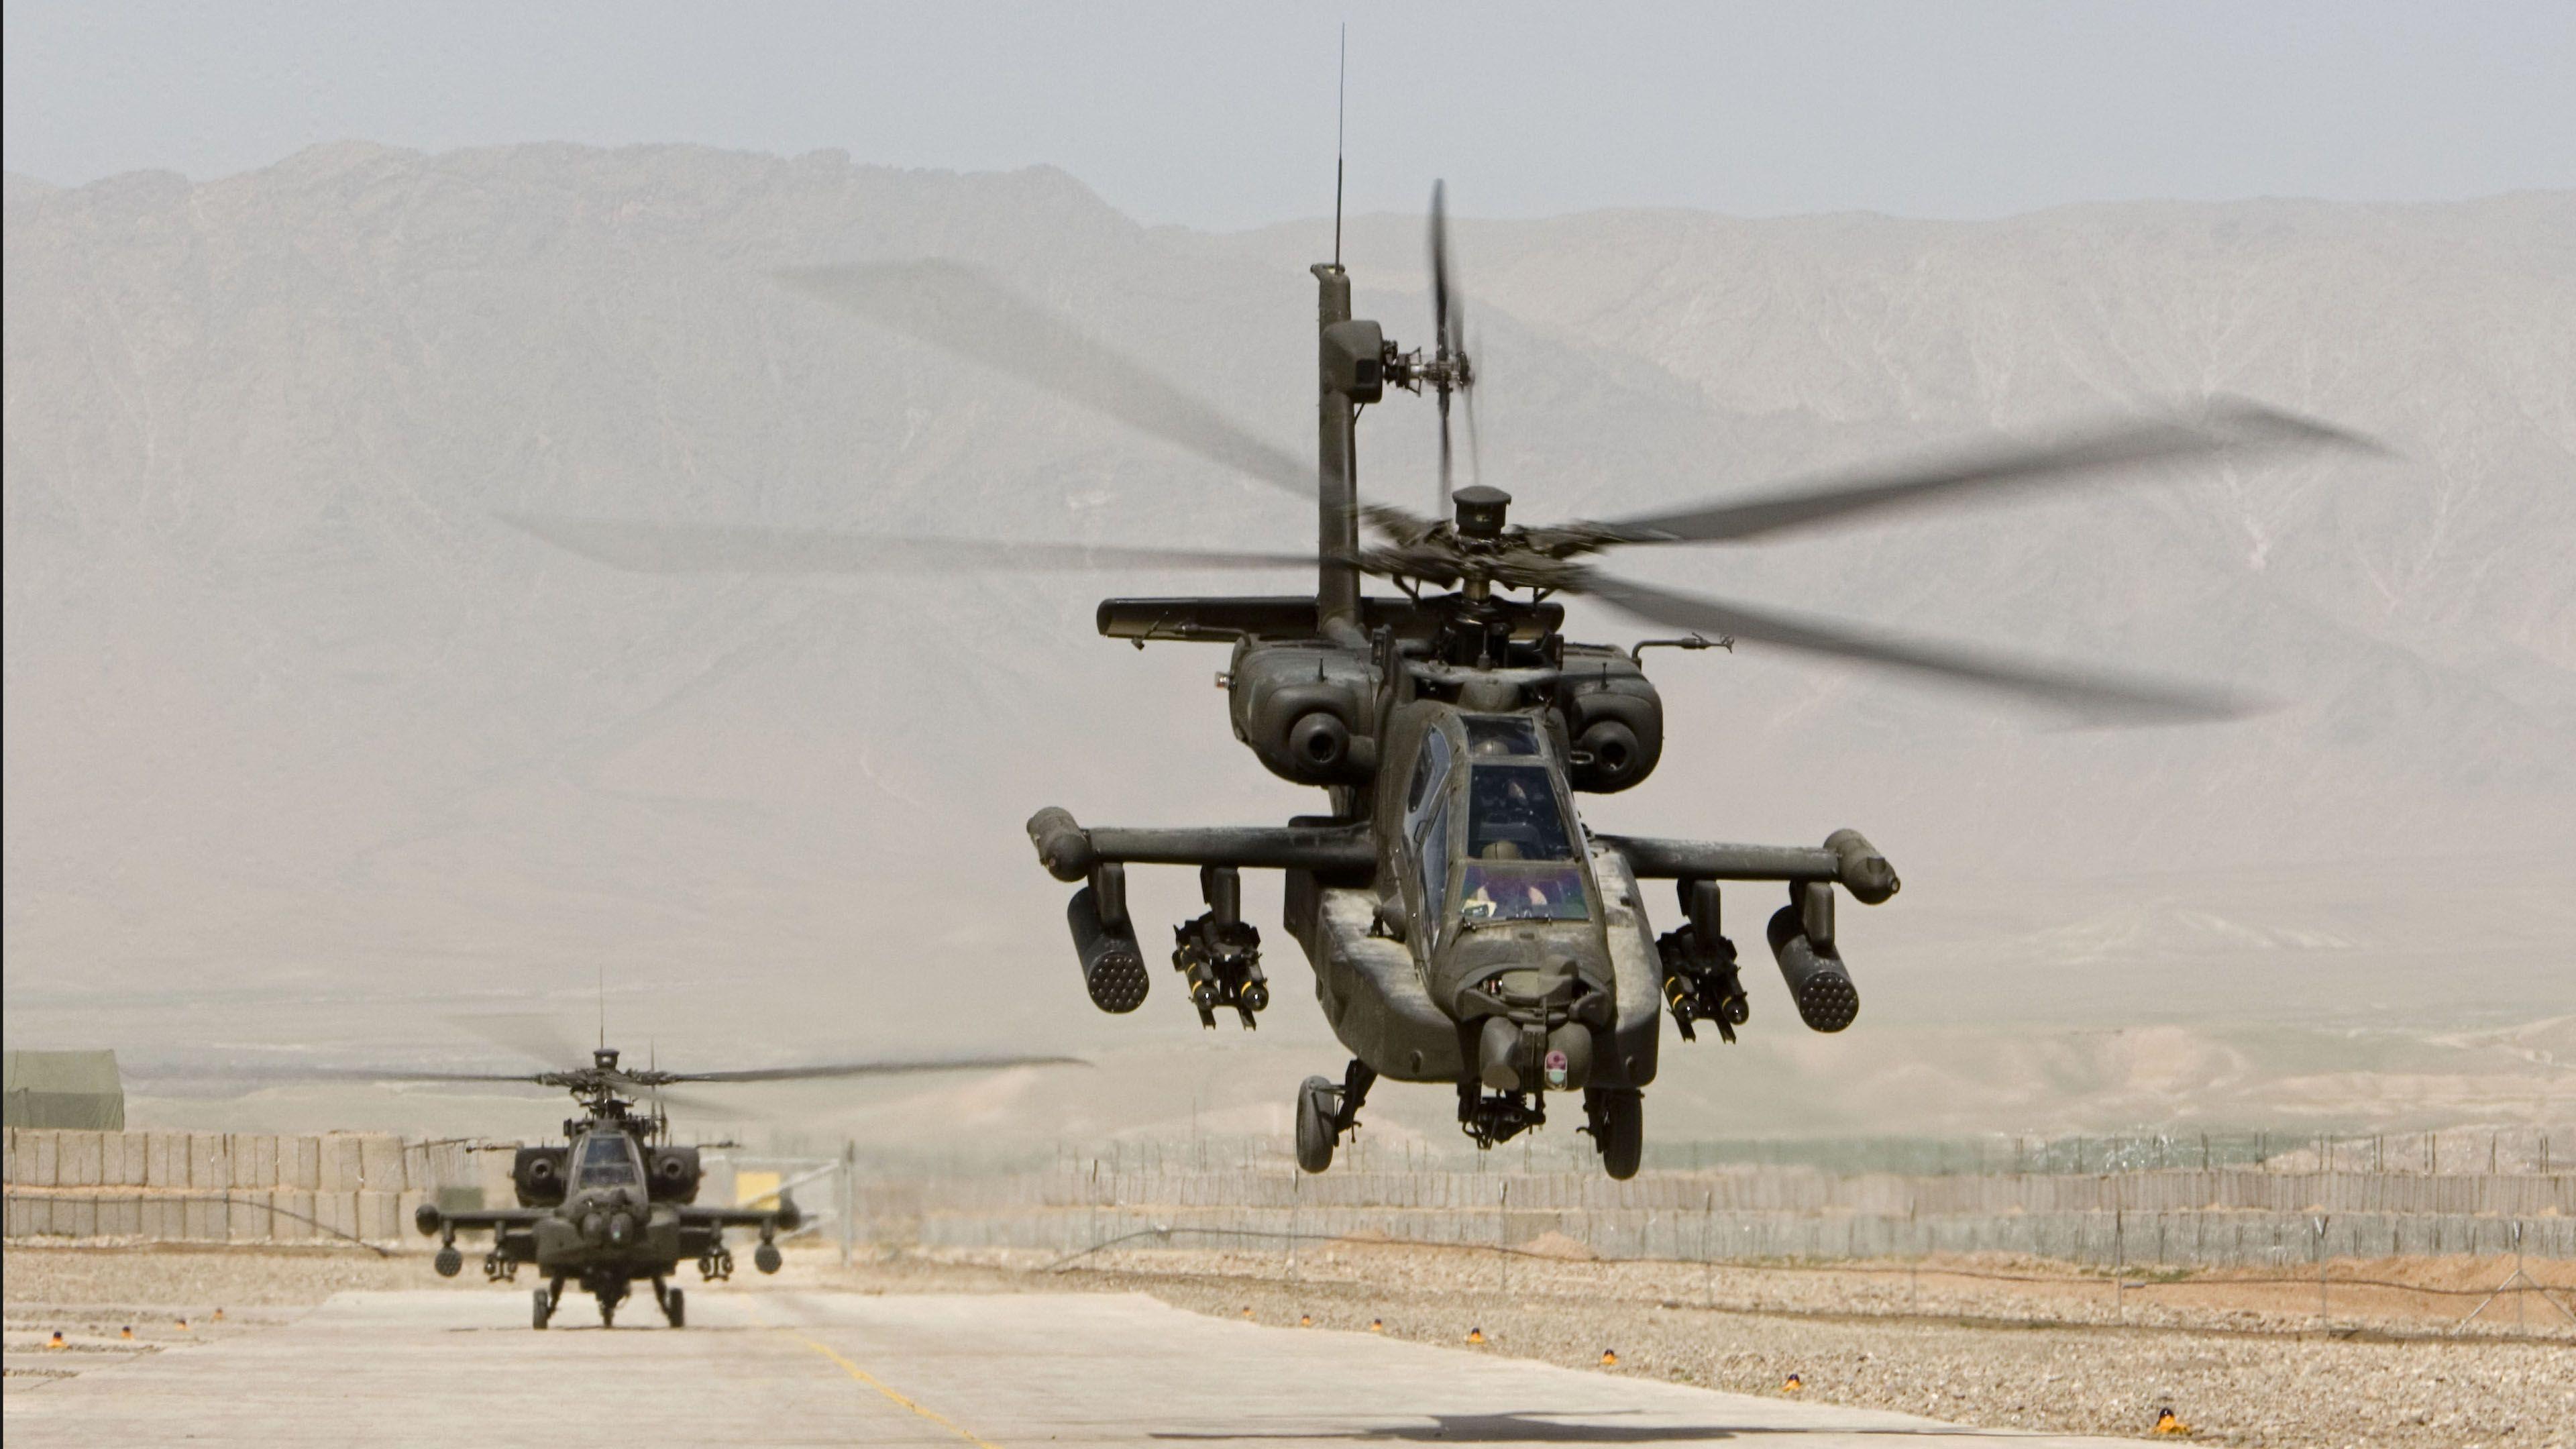 Military Helicopter 4k Hd Desktop Wallpaper For 4k Ultra: Apache Ultra HD 4k Wallpaper